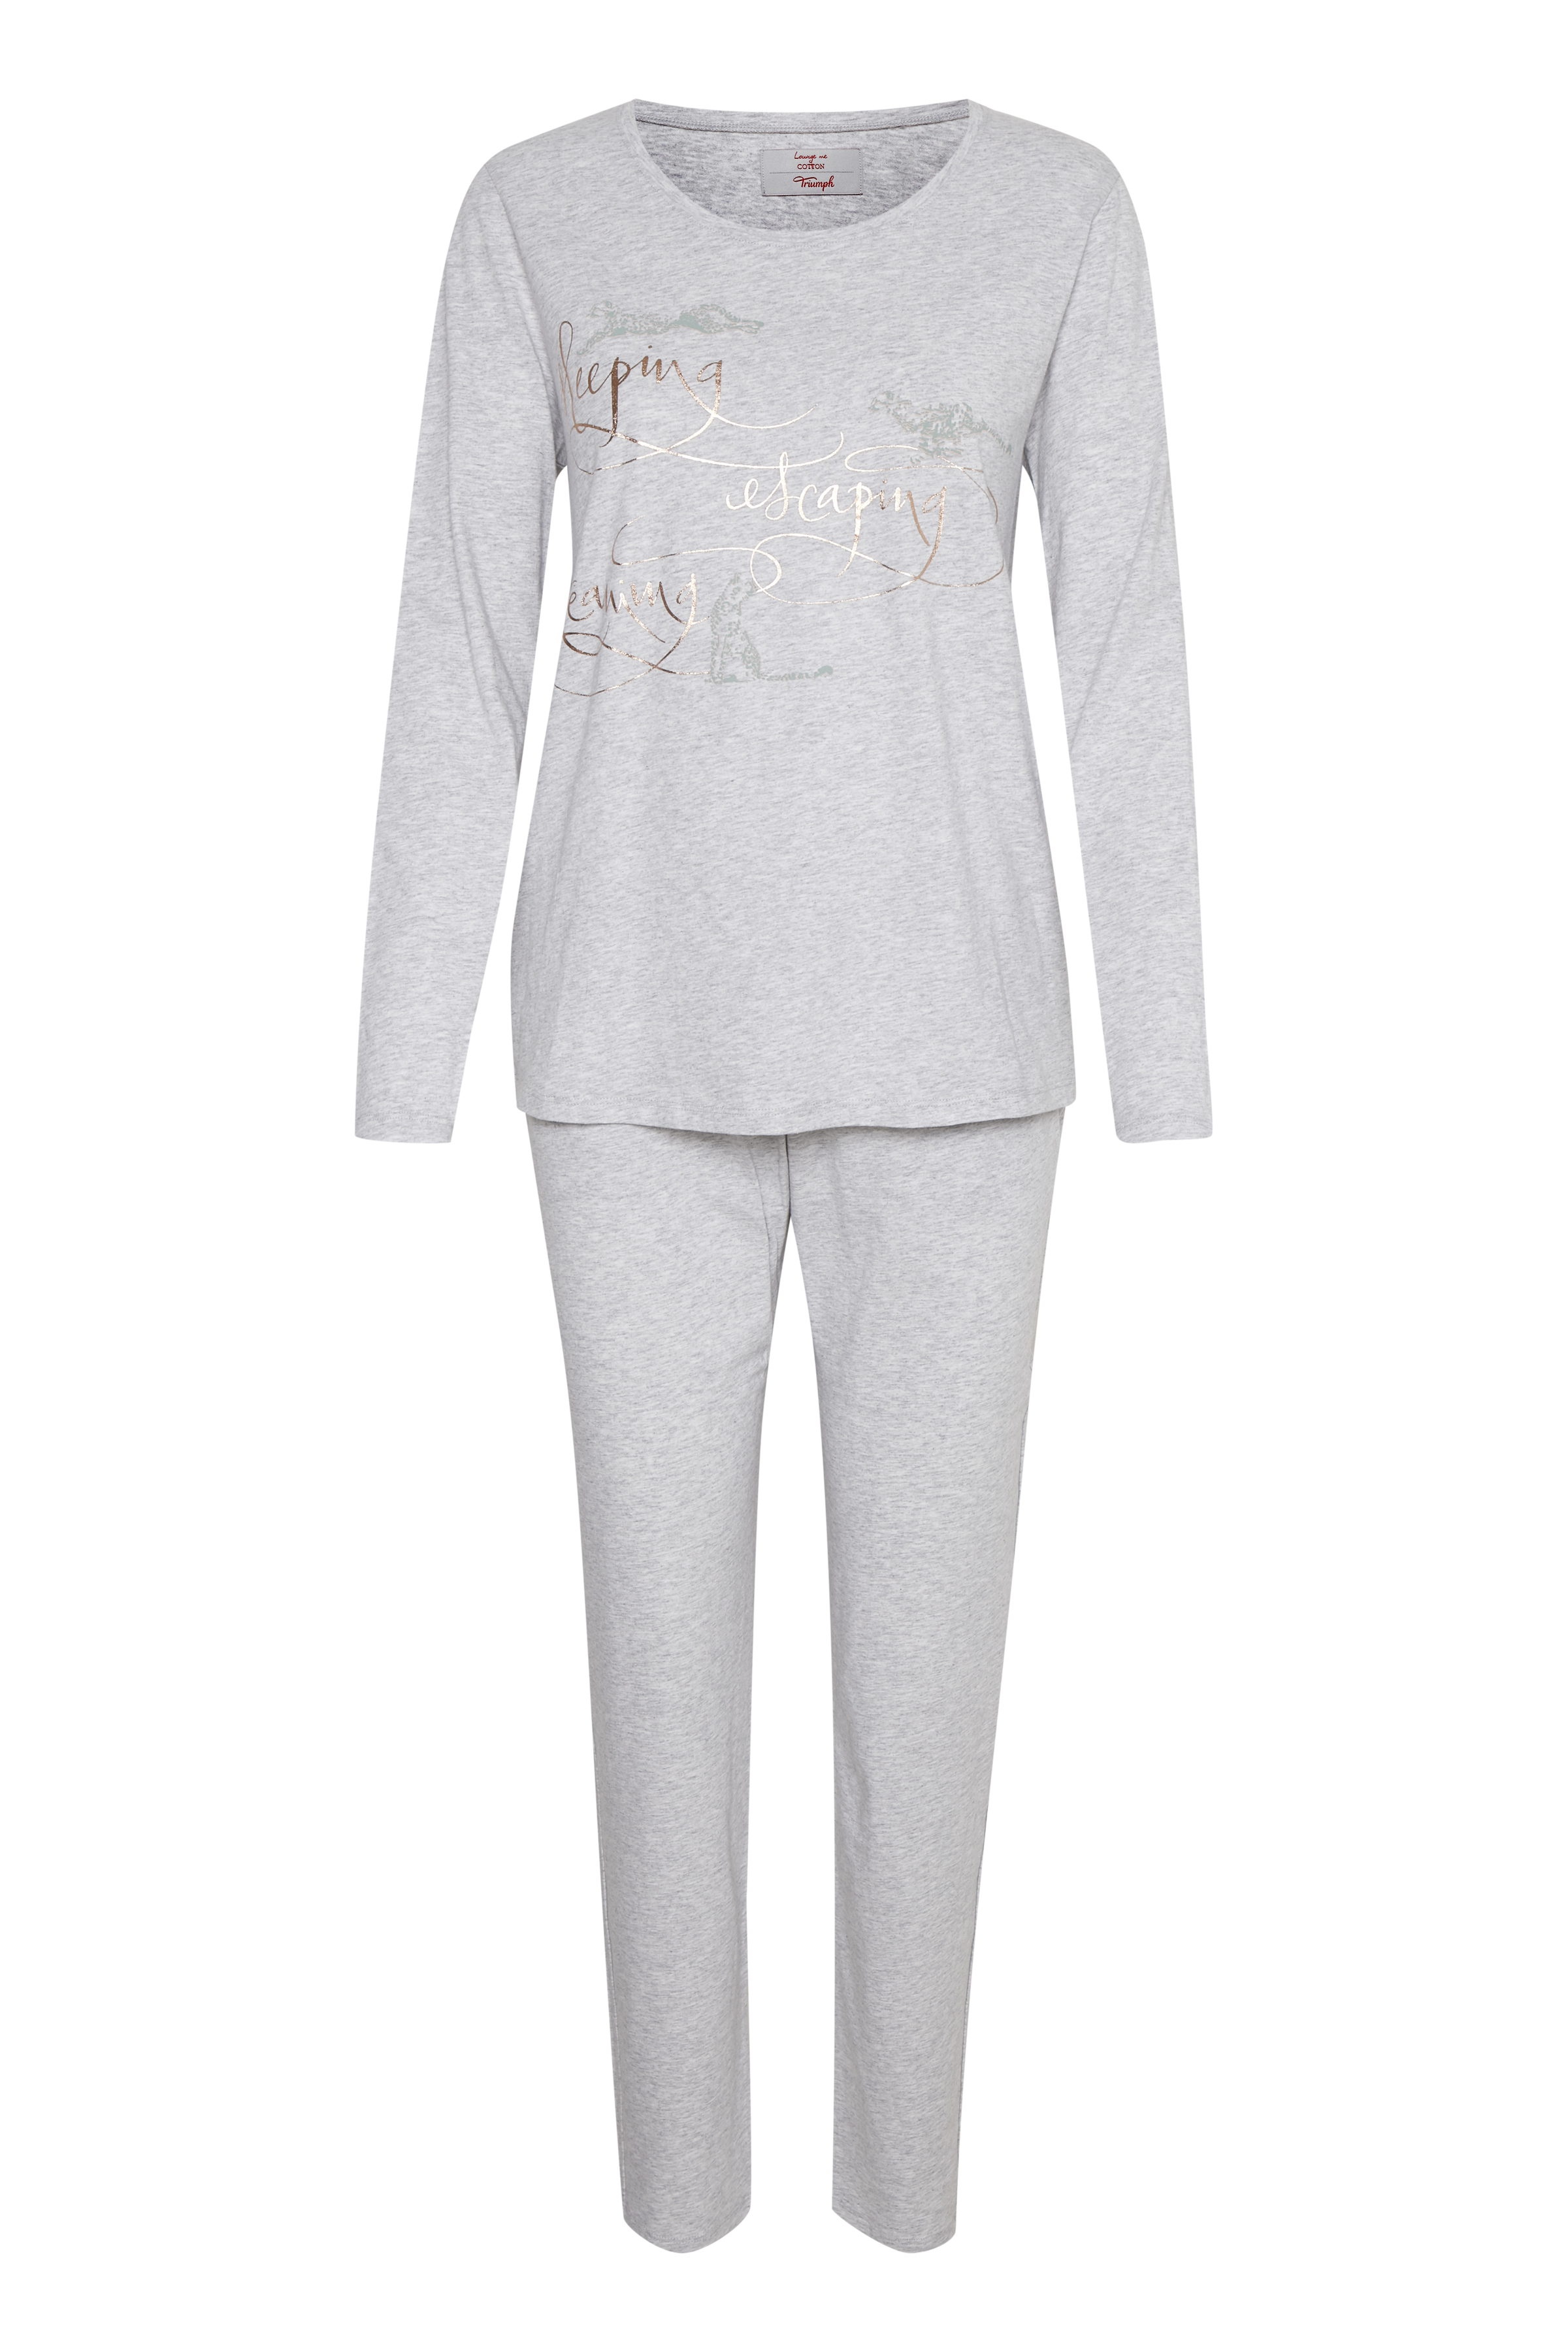 Image of Triumph Dame Homewear sæt - Gråmeleret